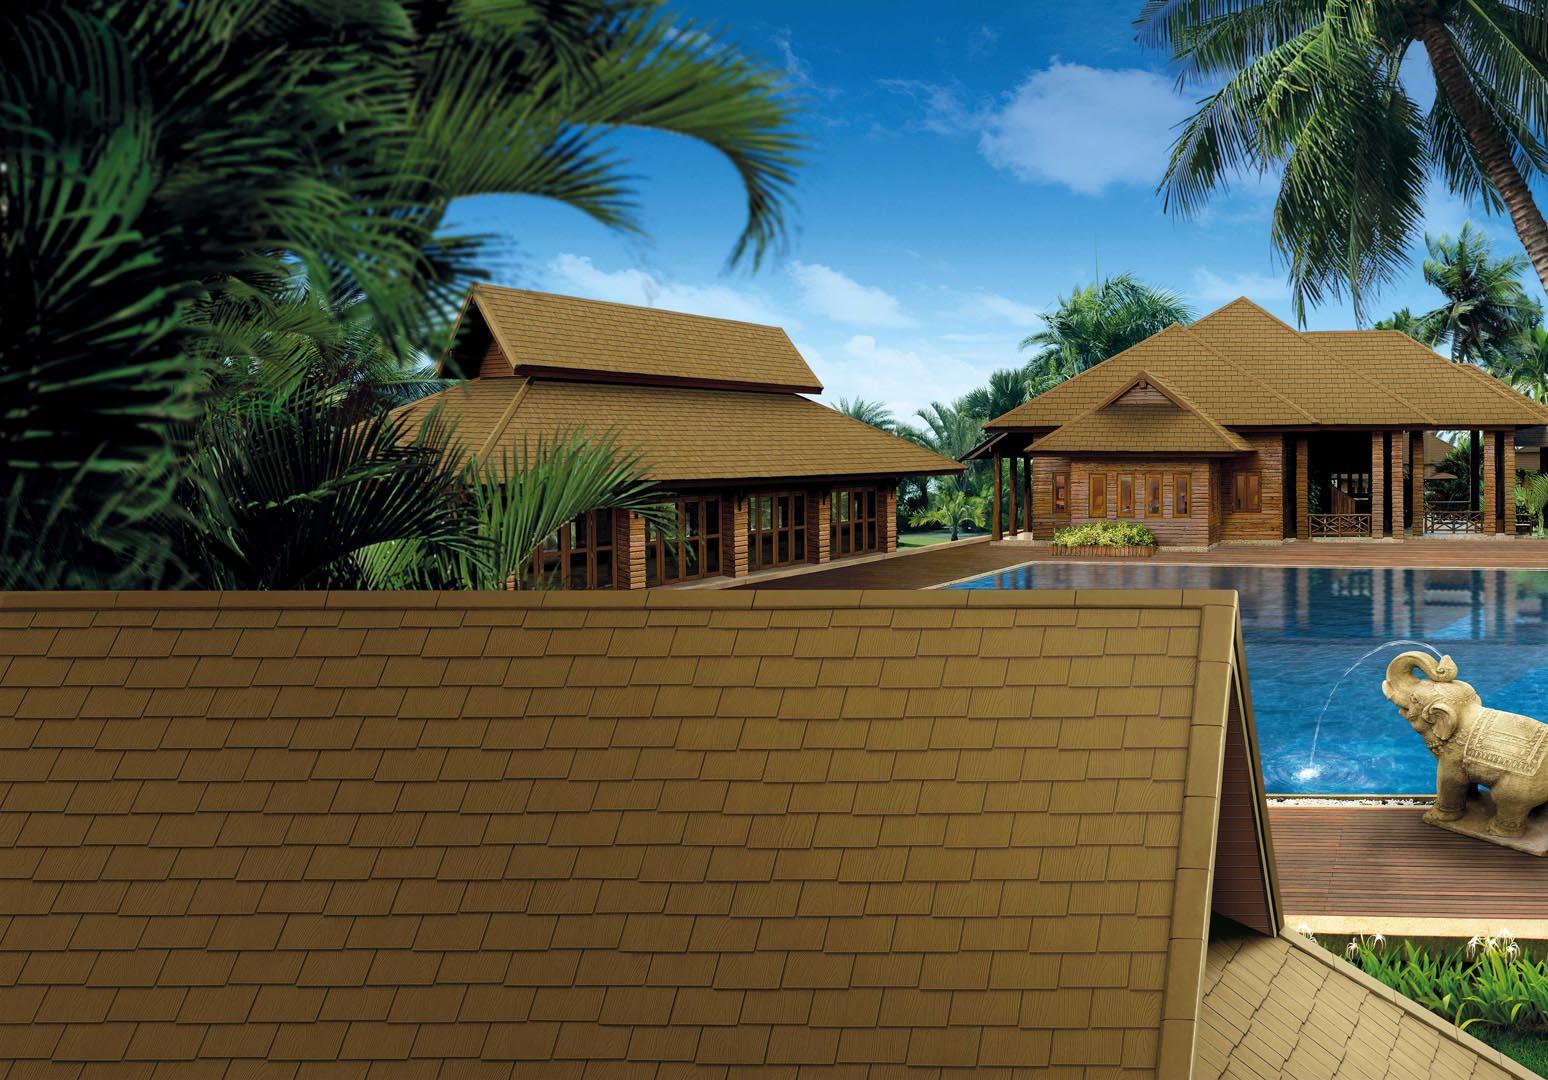 SCG-Fiber-Cement-Roof-Ayara-Timber-Grain-Walnut-Brown-idea